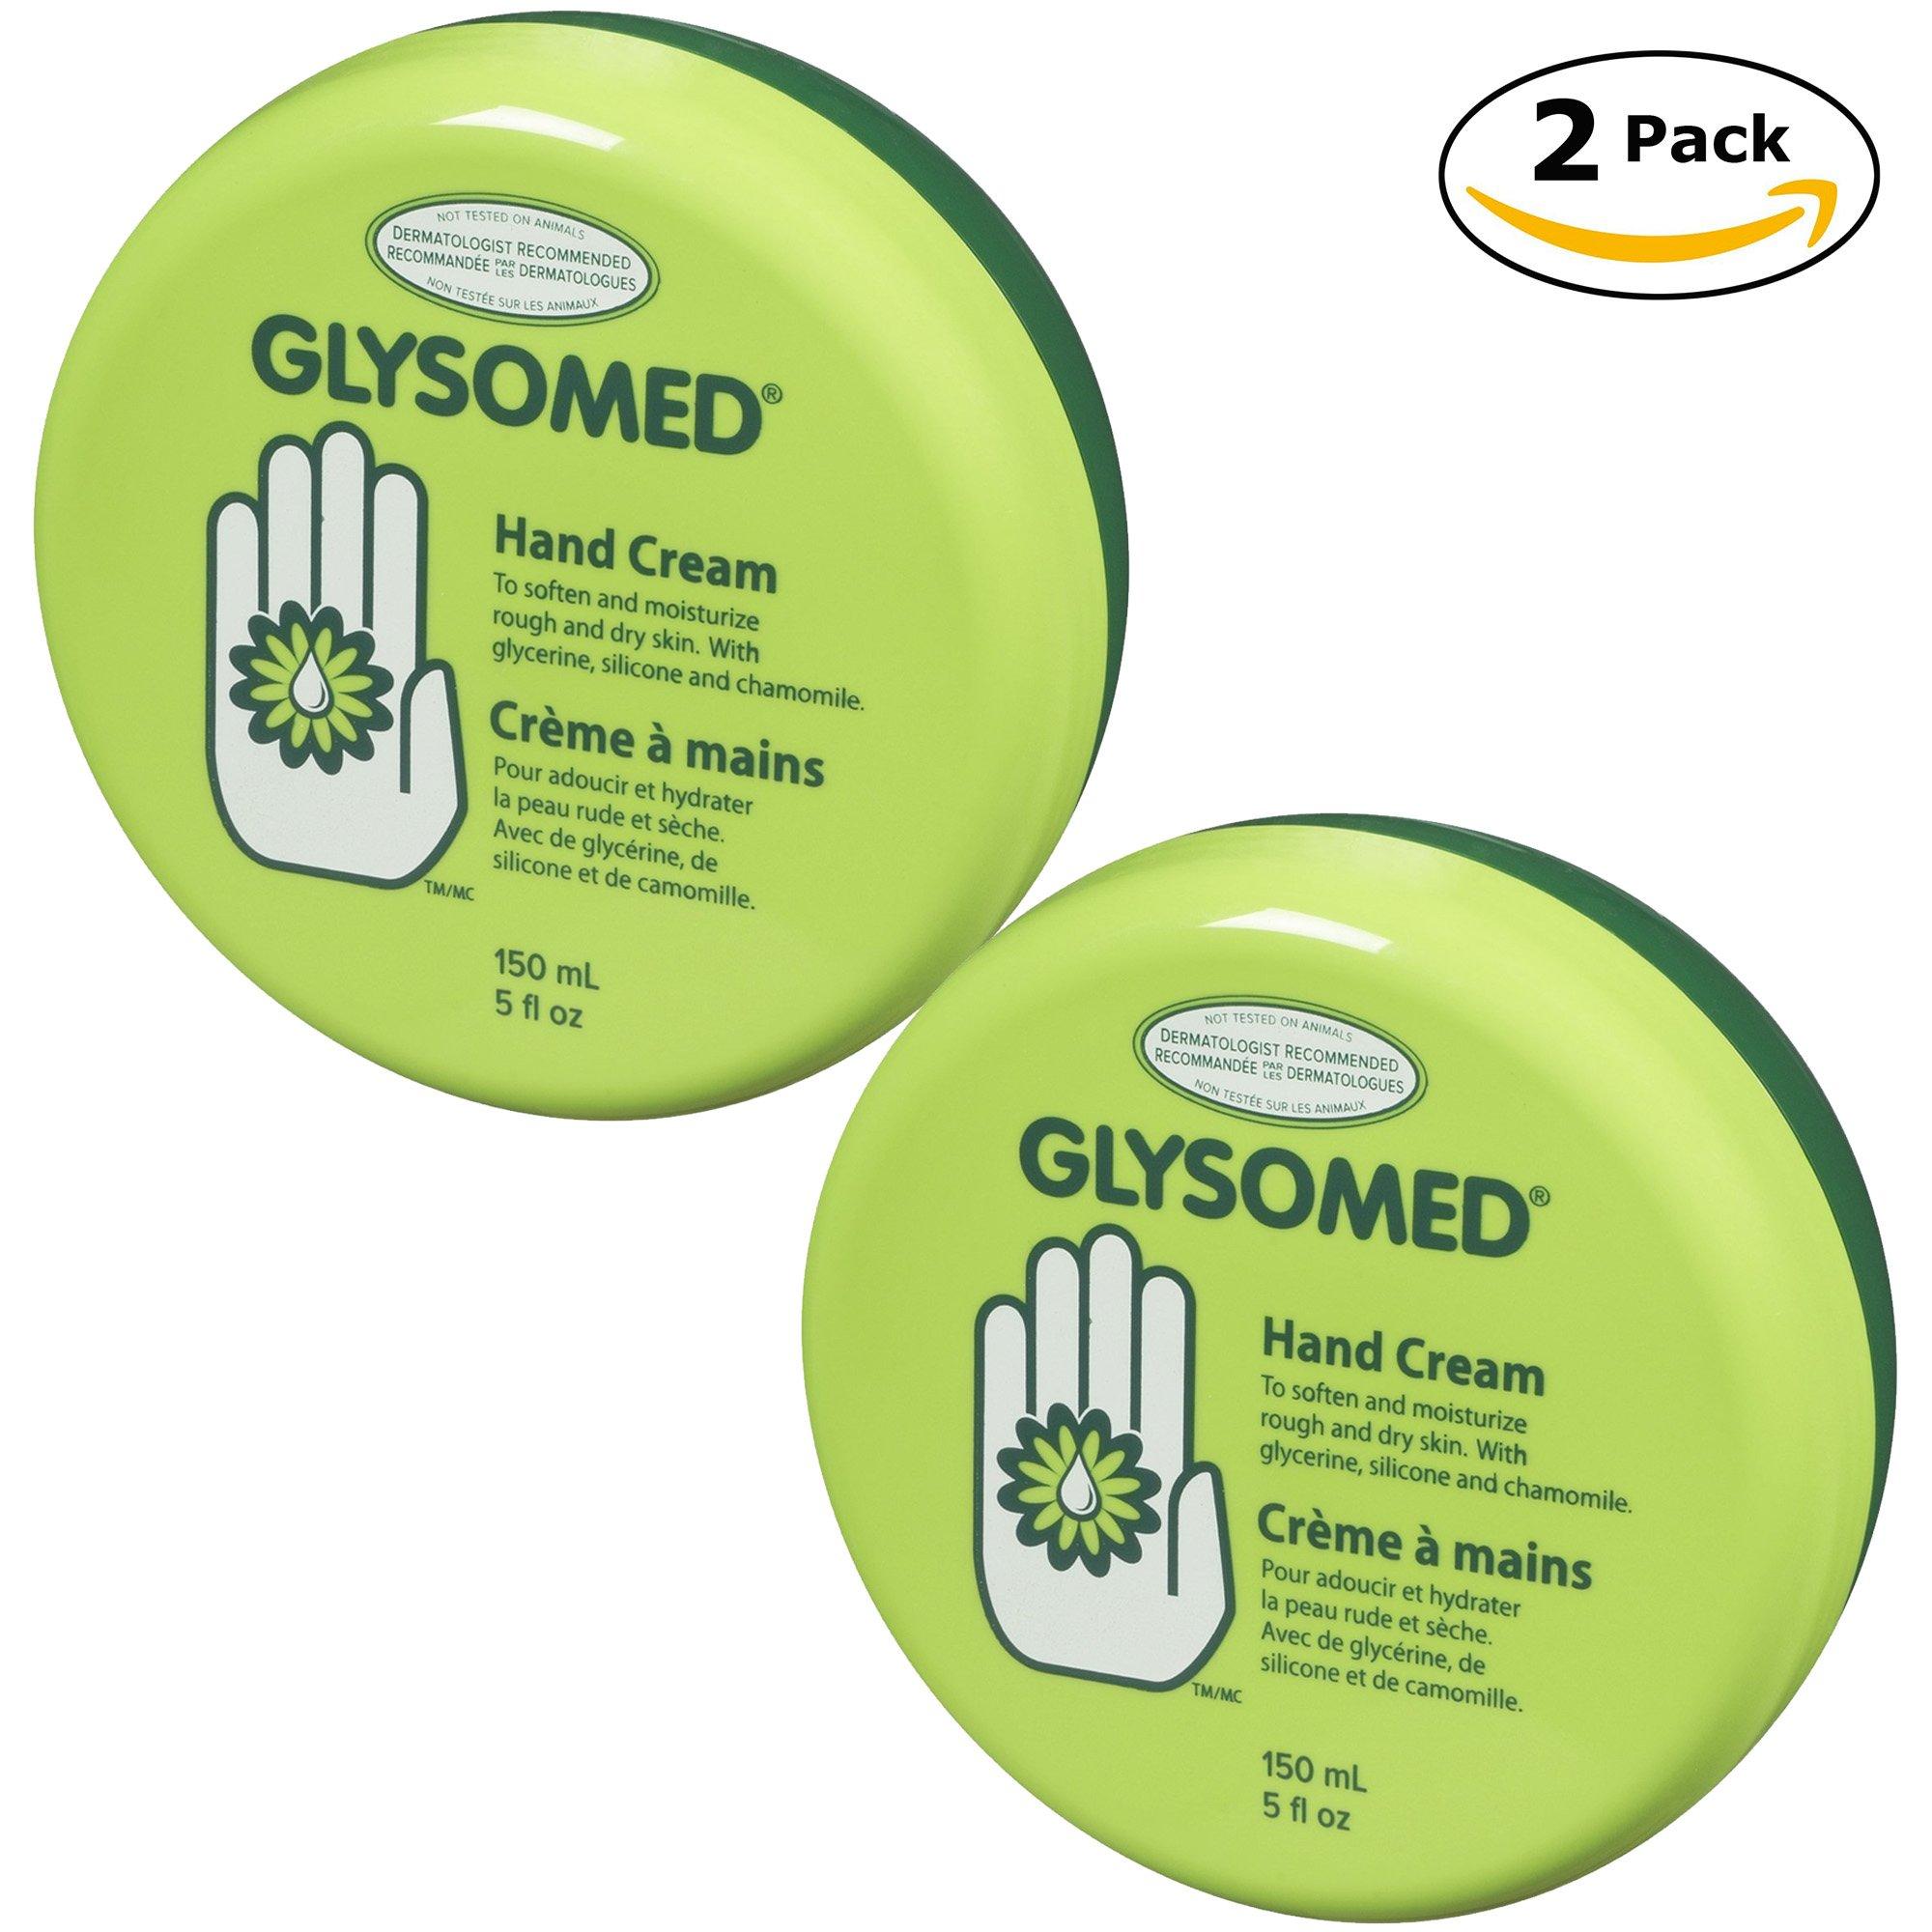 Glysomed Regular Hand Cream Twin Pack Total 10 Fl. Oz (2 x 5 Fl. Oz) by Glysomed